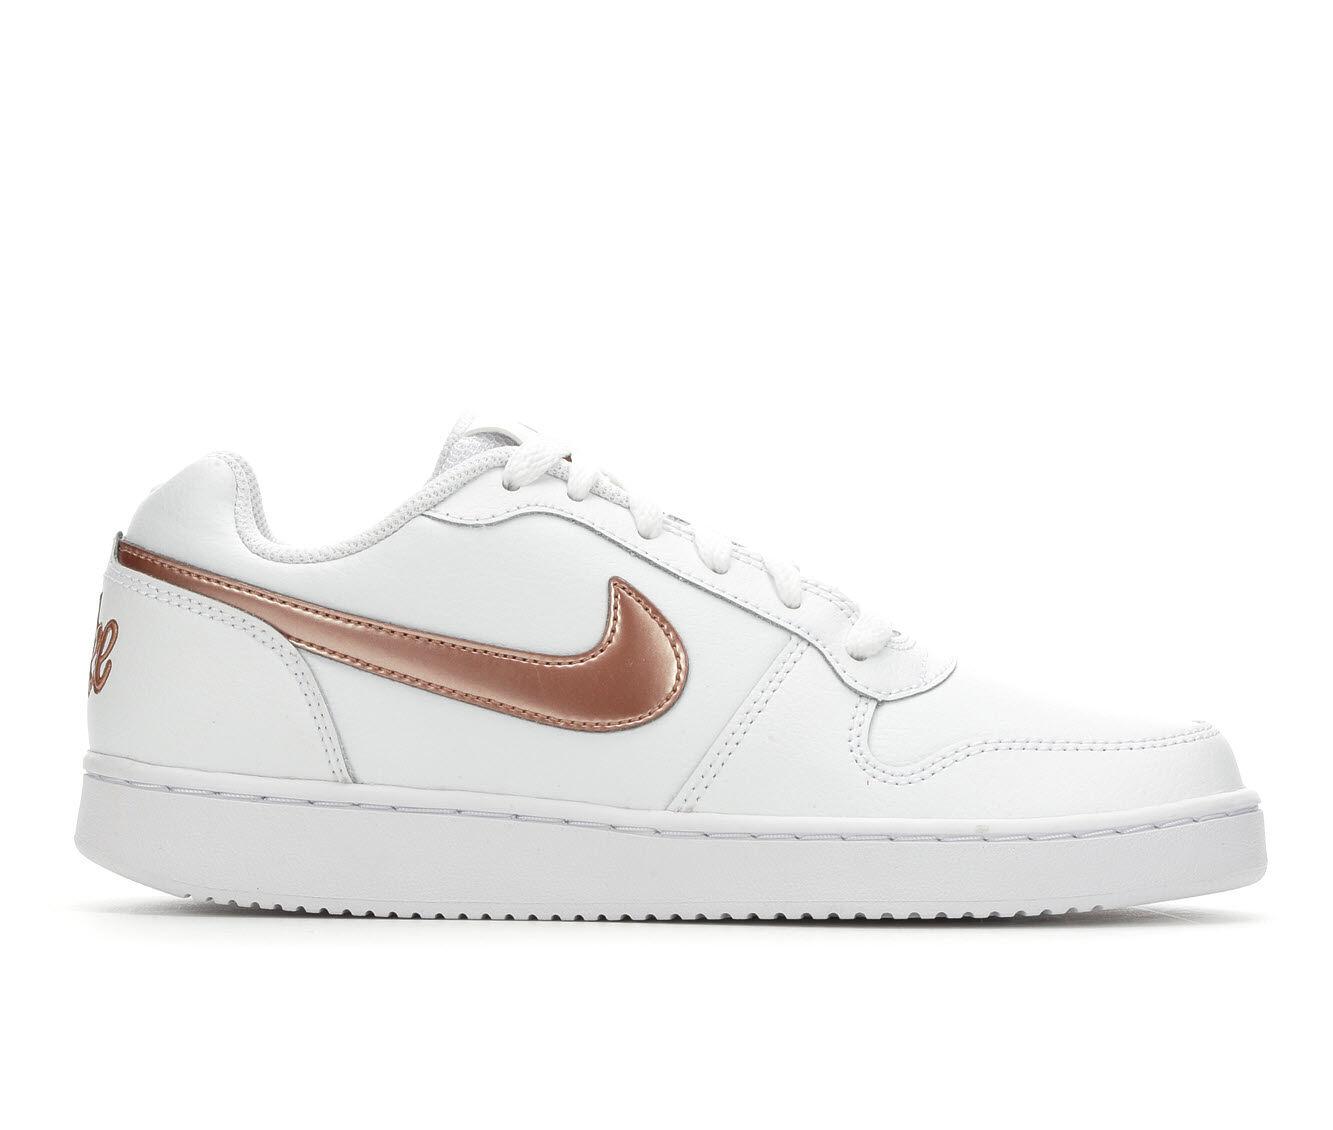 Women's Nike Ebernon Low Basketball Shoes Wht/Red Bronze